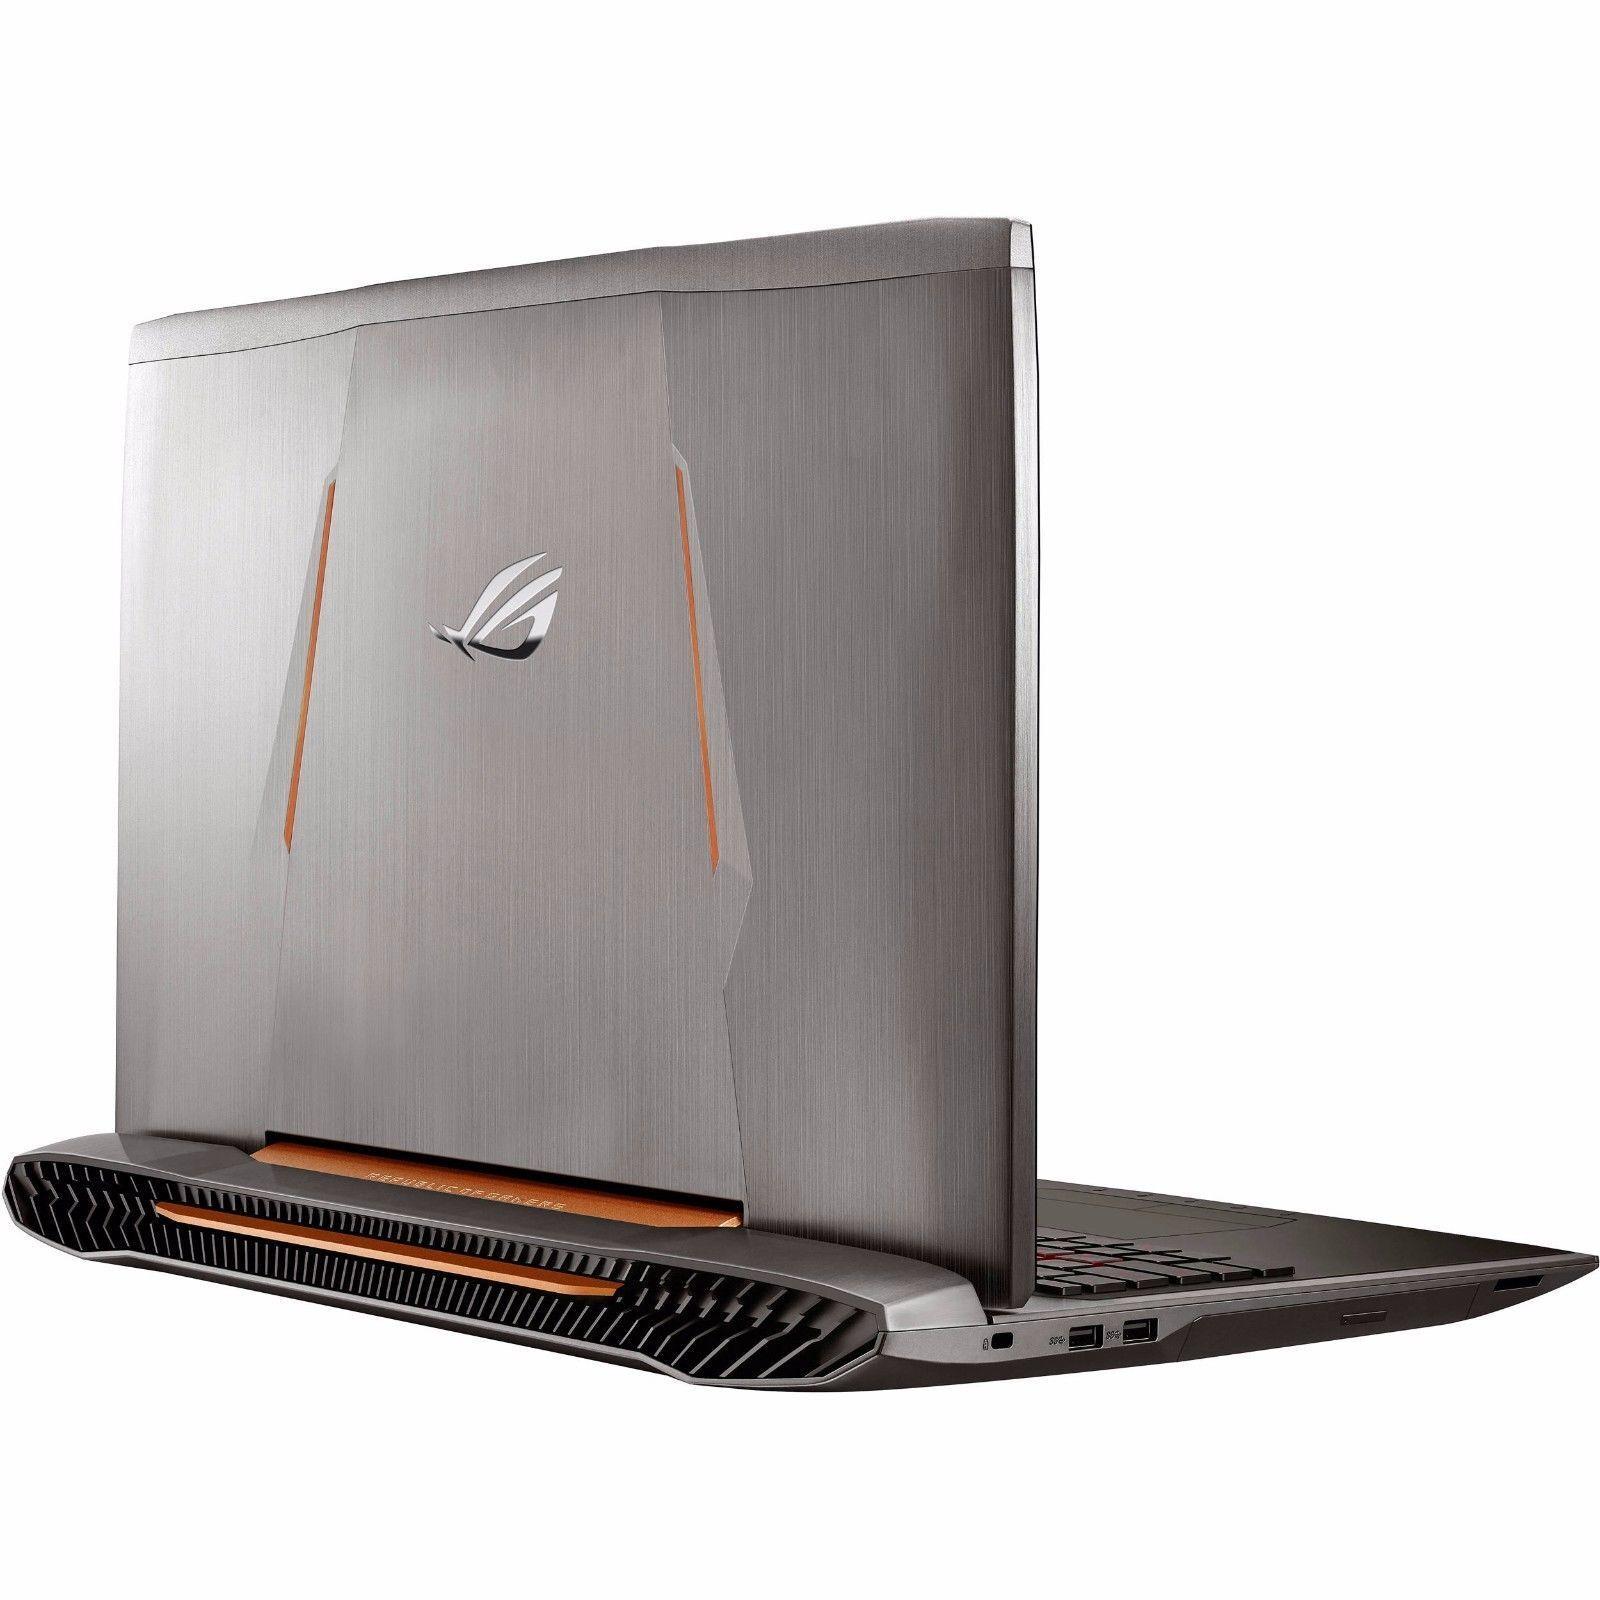 "Asus Gaming ROG G752VL 17.3"" i7-6700H 64GB RAM 250G SSD+1TB GTX 965M, UPGRADED!"